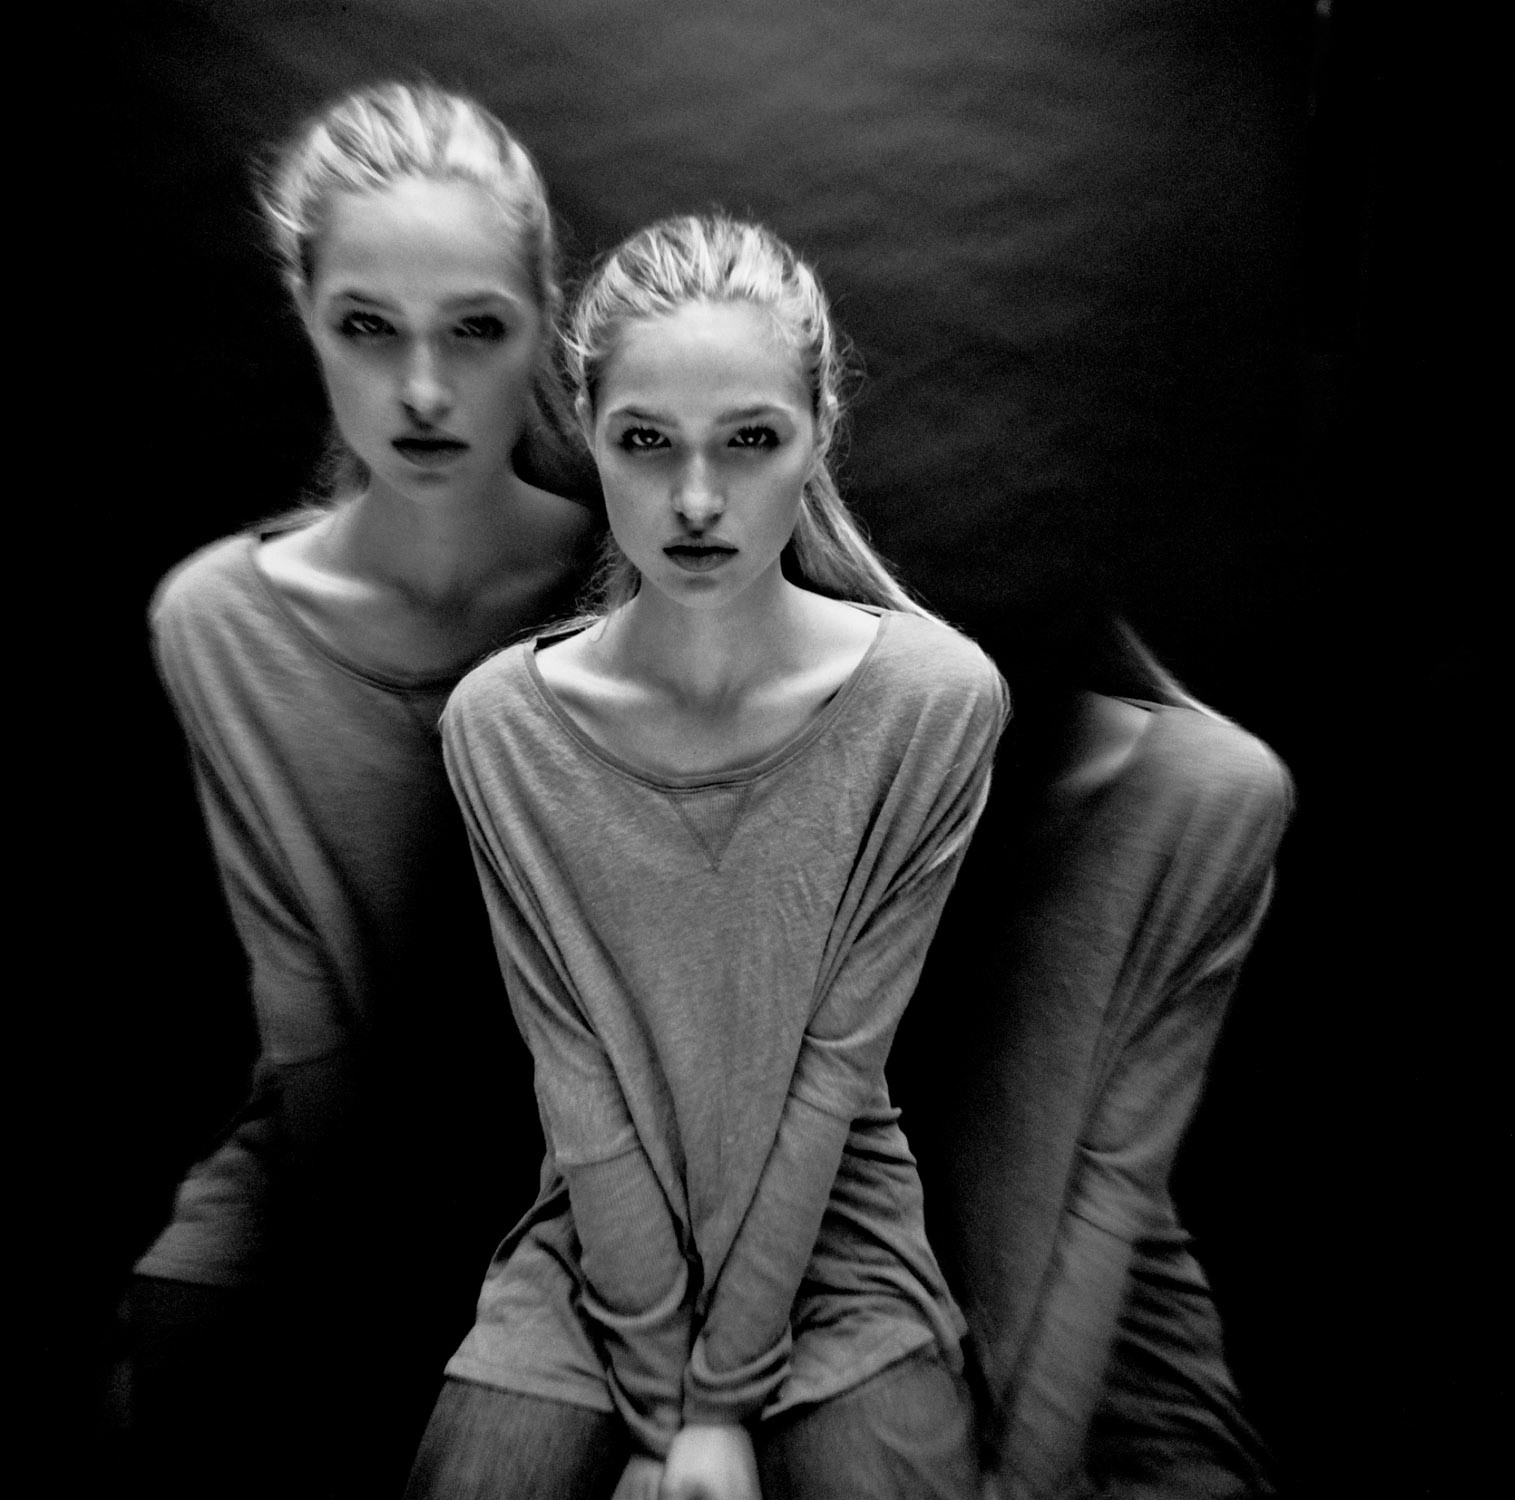 Portraits-46.jpg